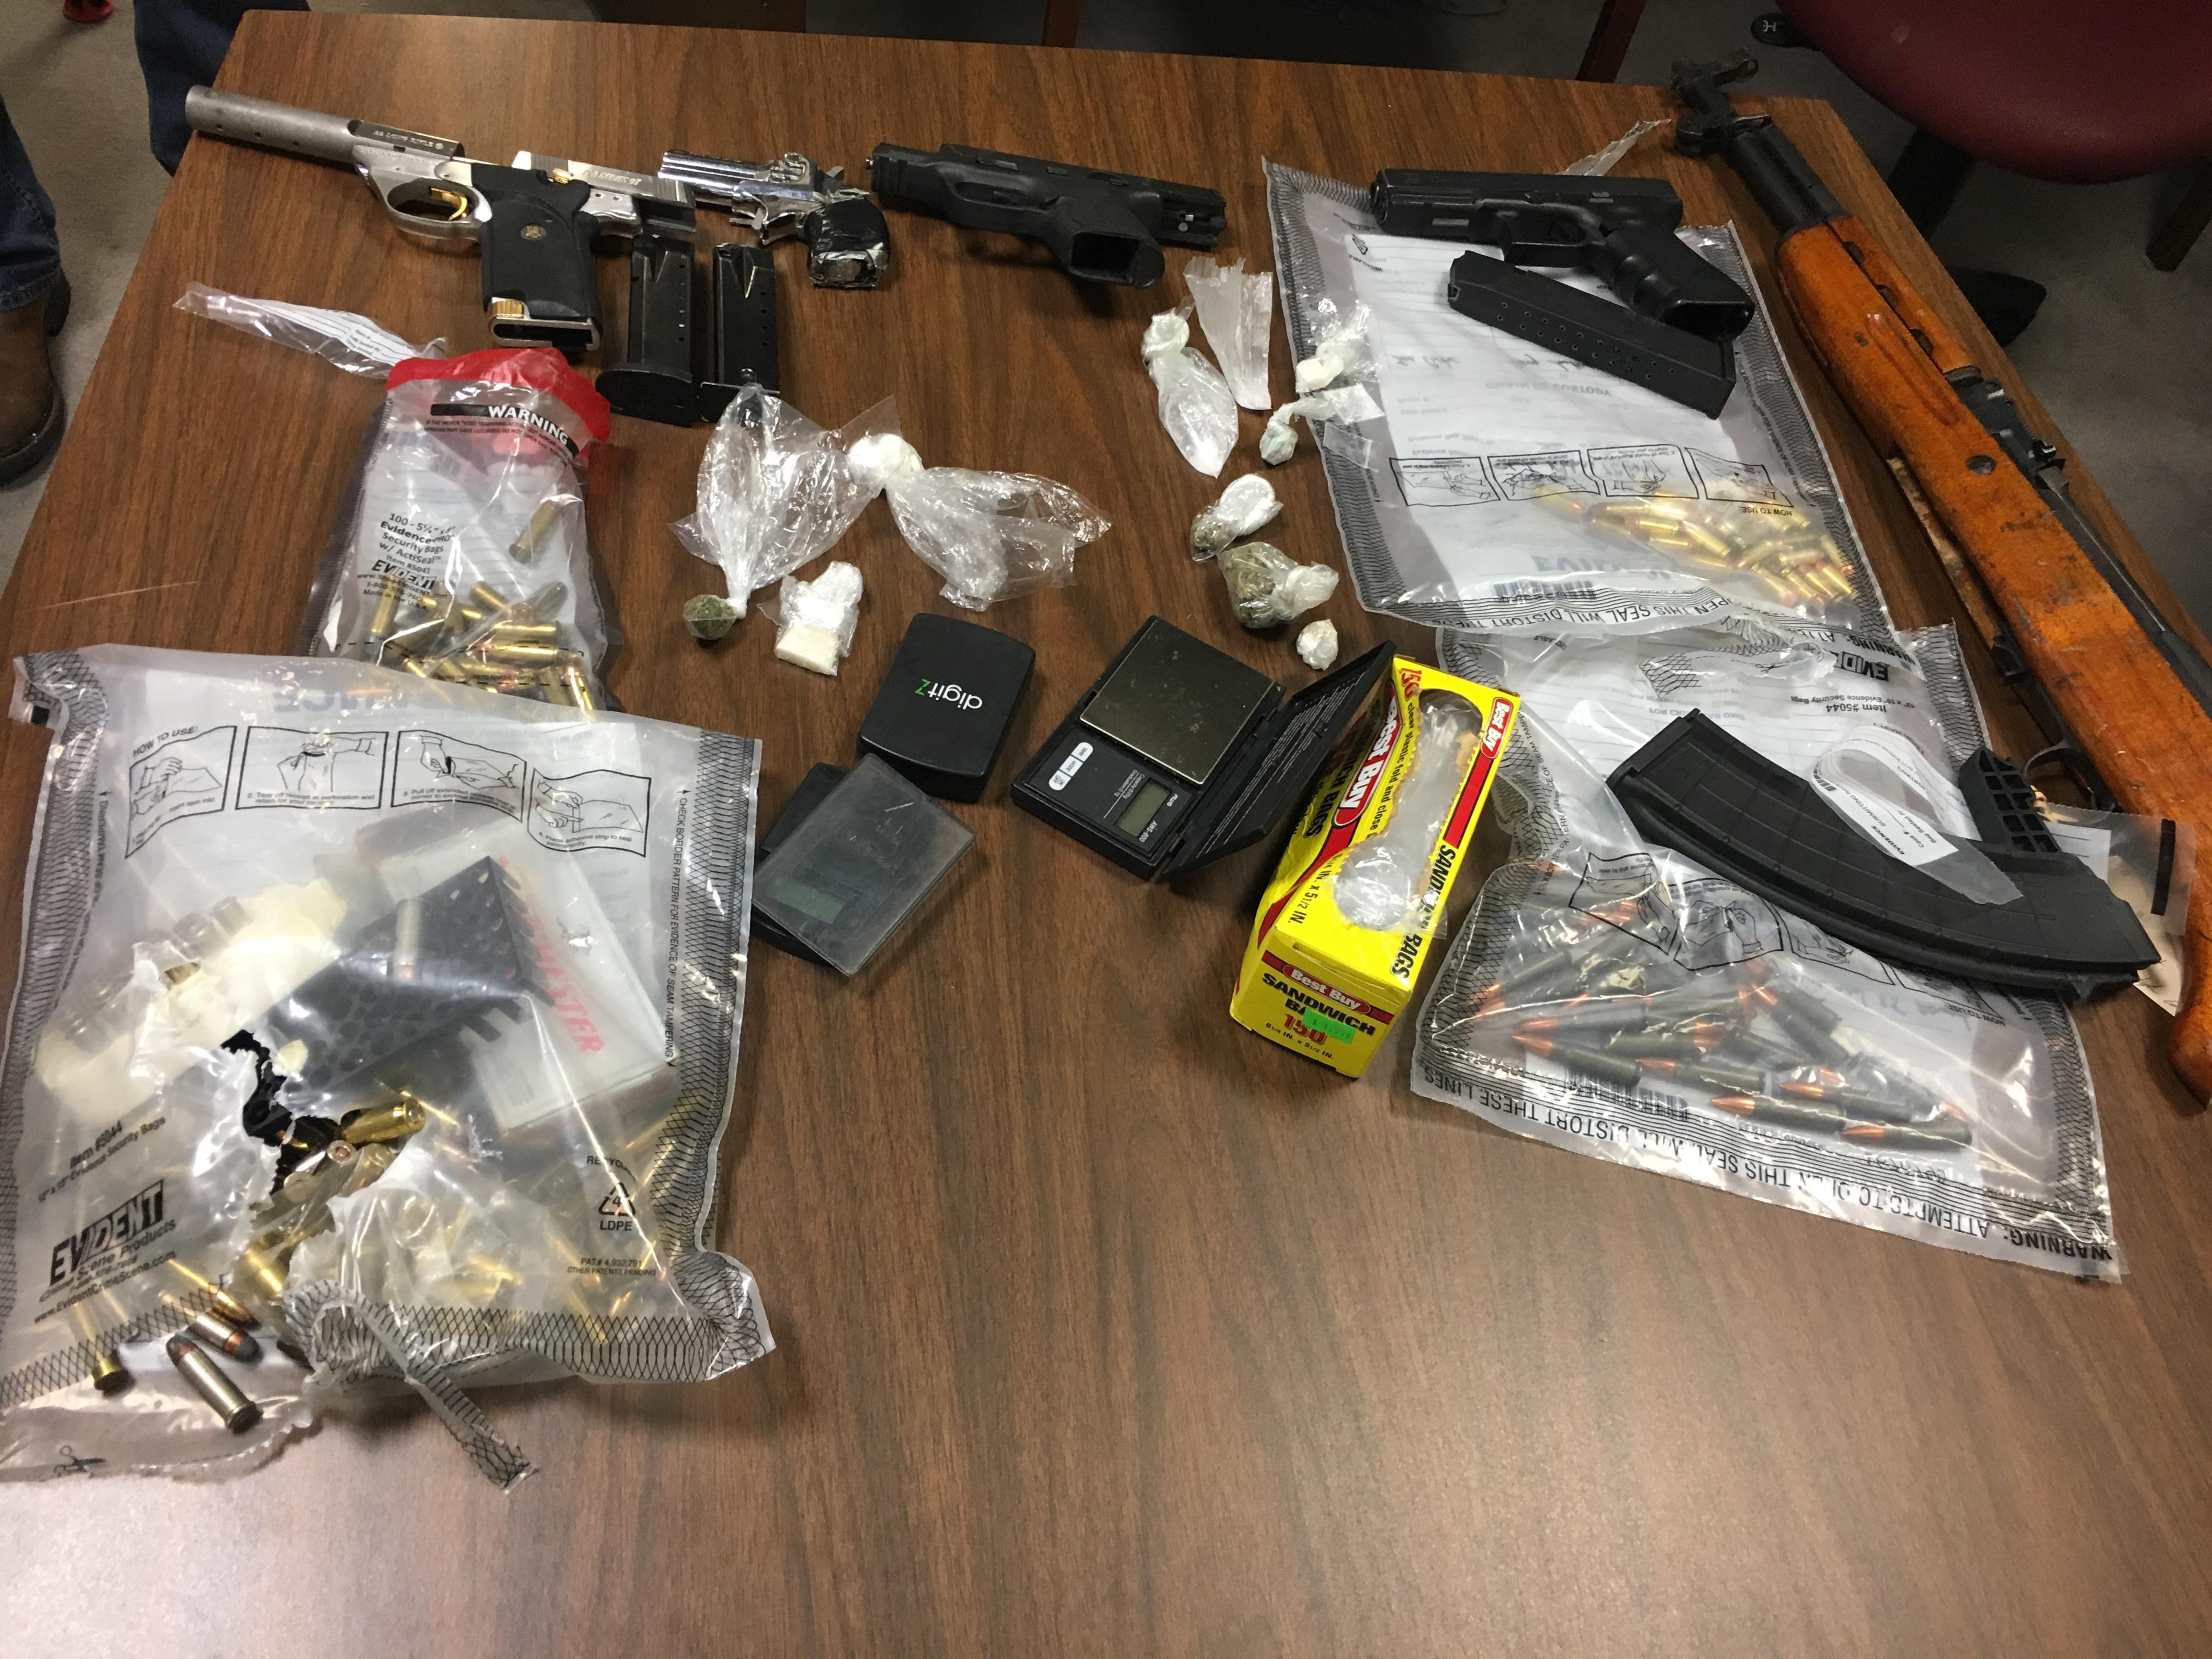 6 arrests, 5 guns & multiple drugs seized by MCSO